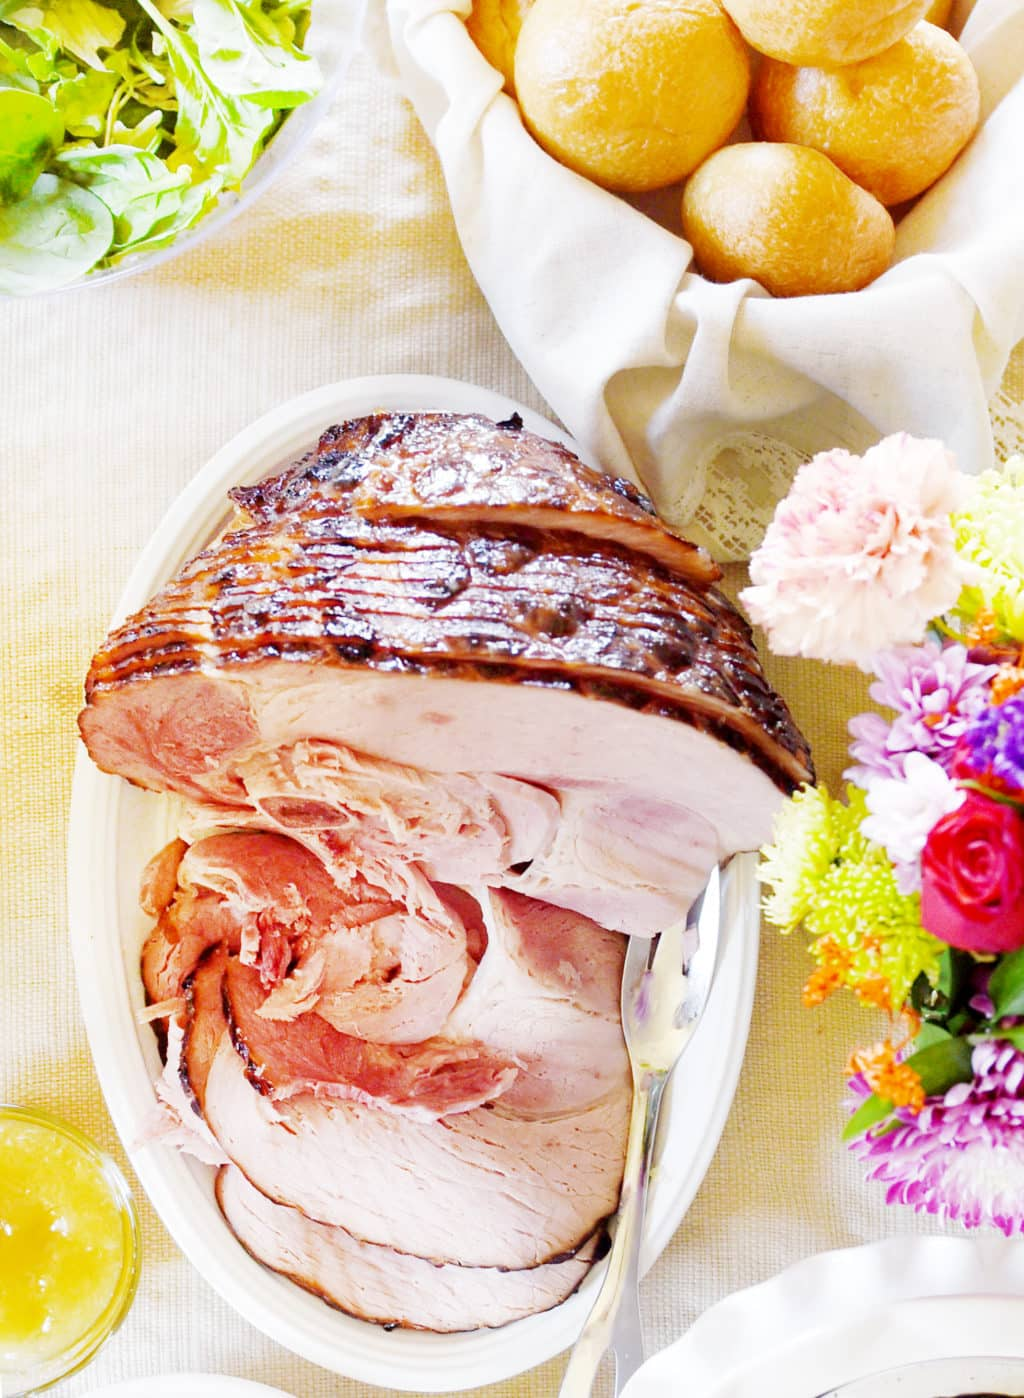 A sliced ham on a plate